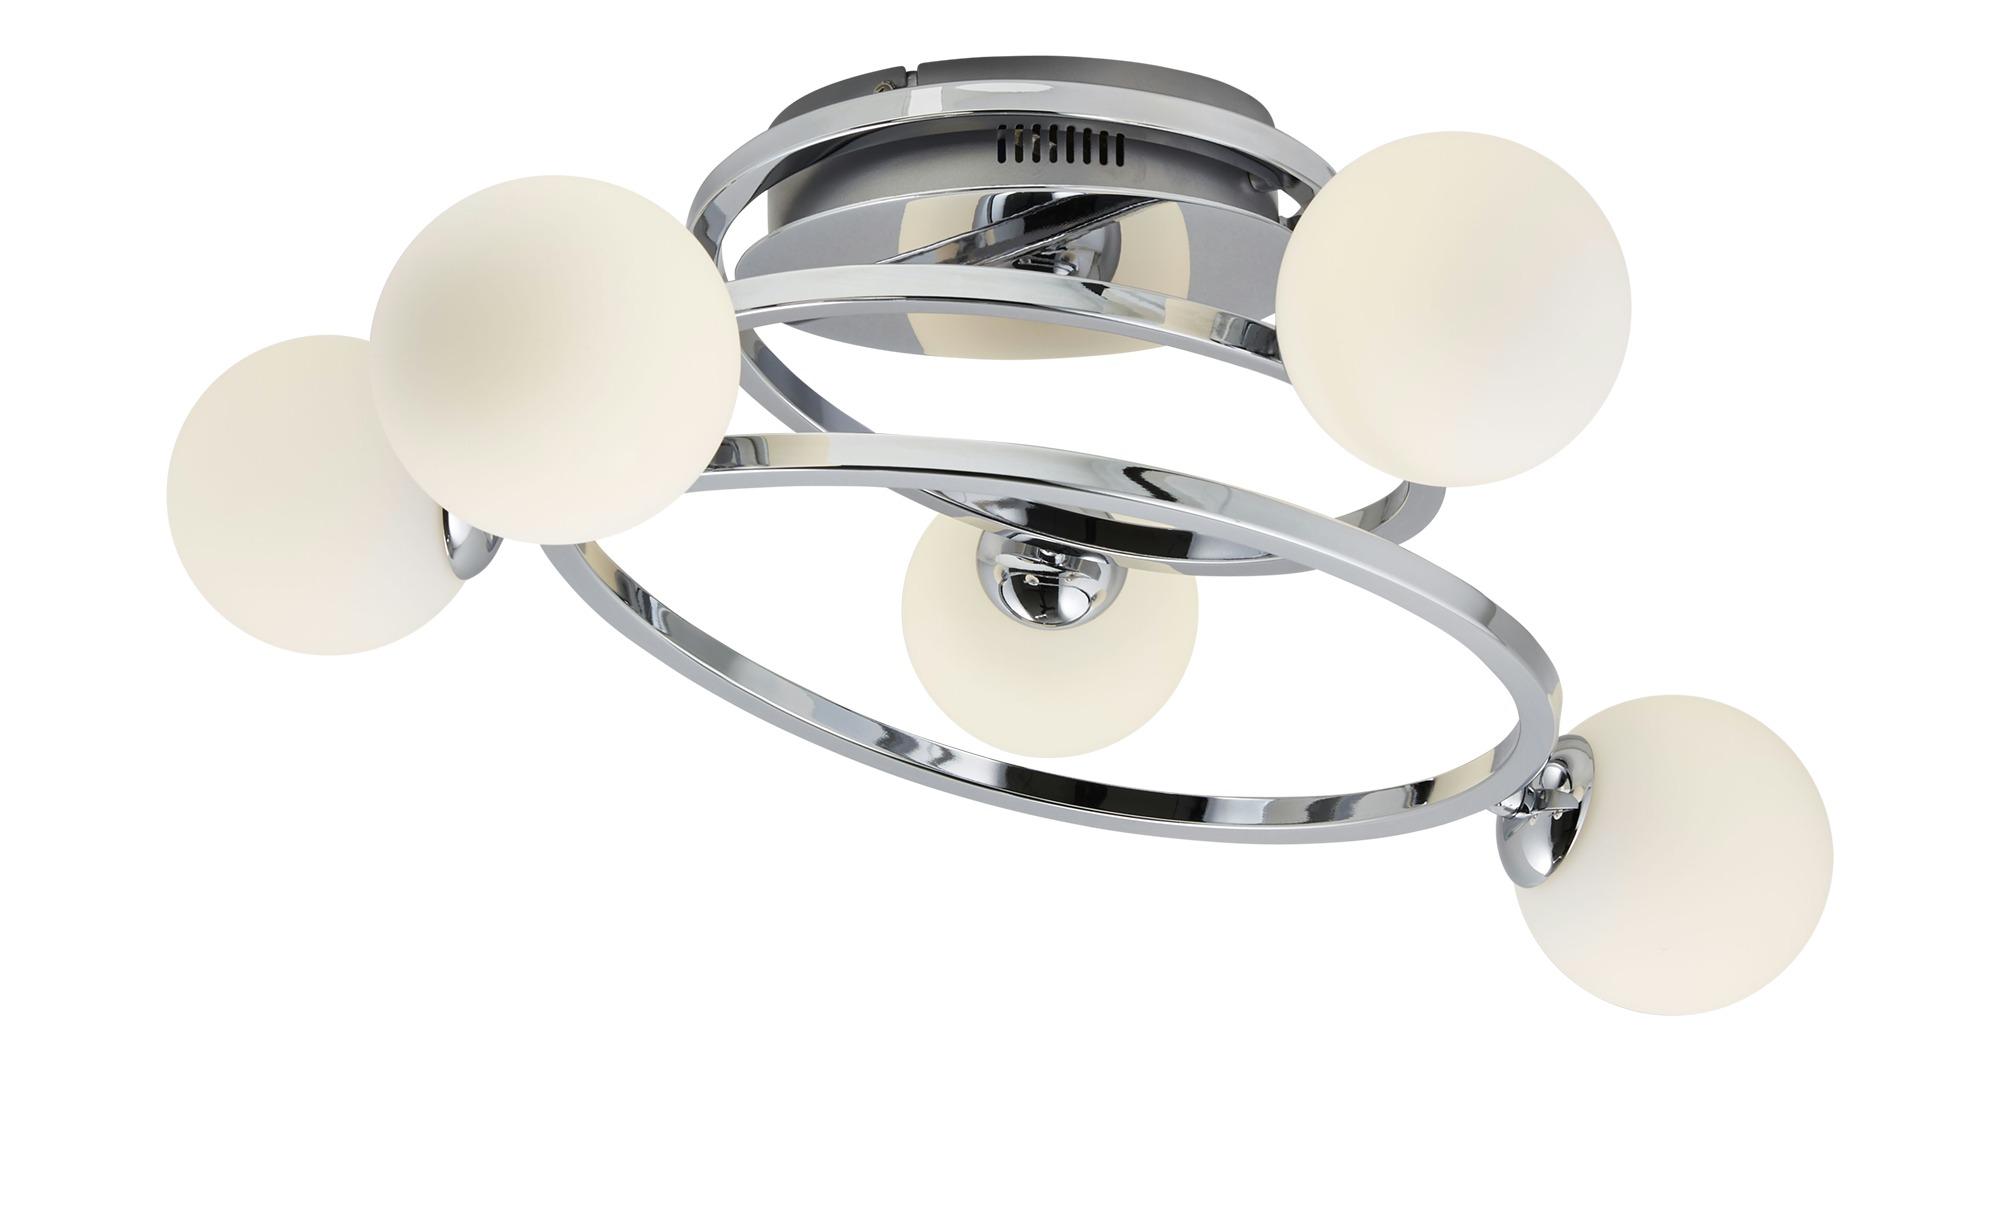 KHG LED-Deckenleuchte, 5-flammig ¦ silber ¦ Maße (cm): B: 47 H: 22 Lampen & Leuchten > Innenleuchten > Deckenleuchten - Höffner